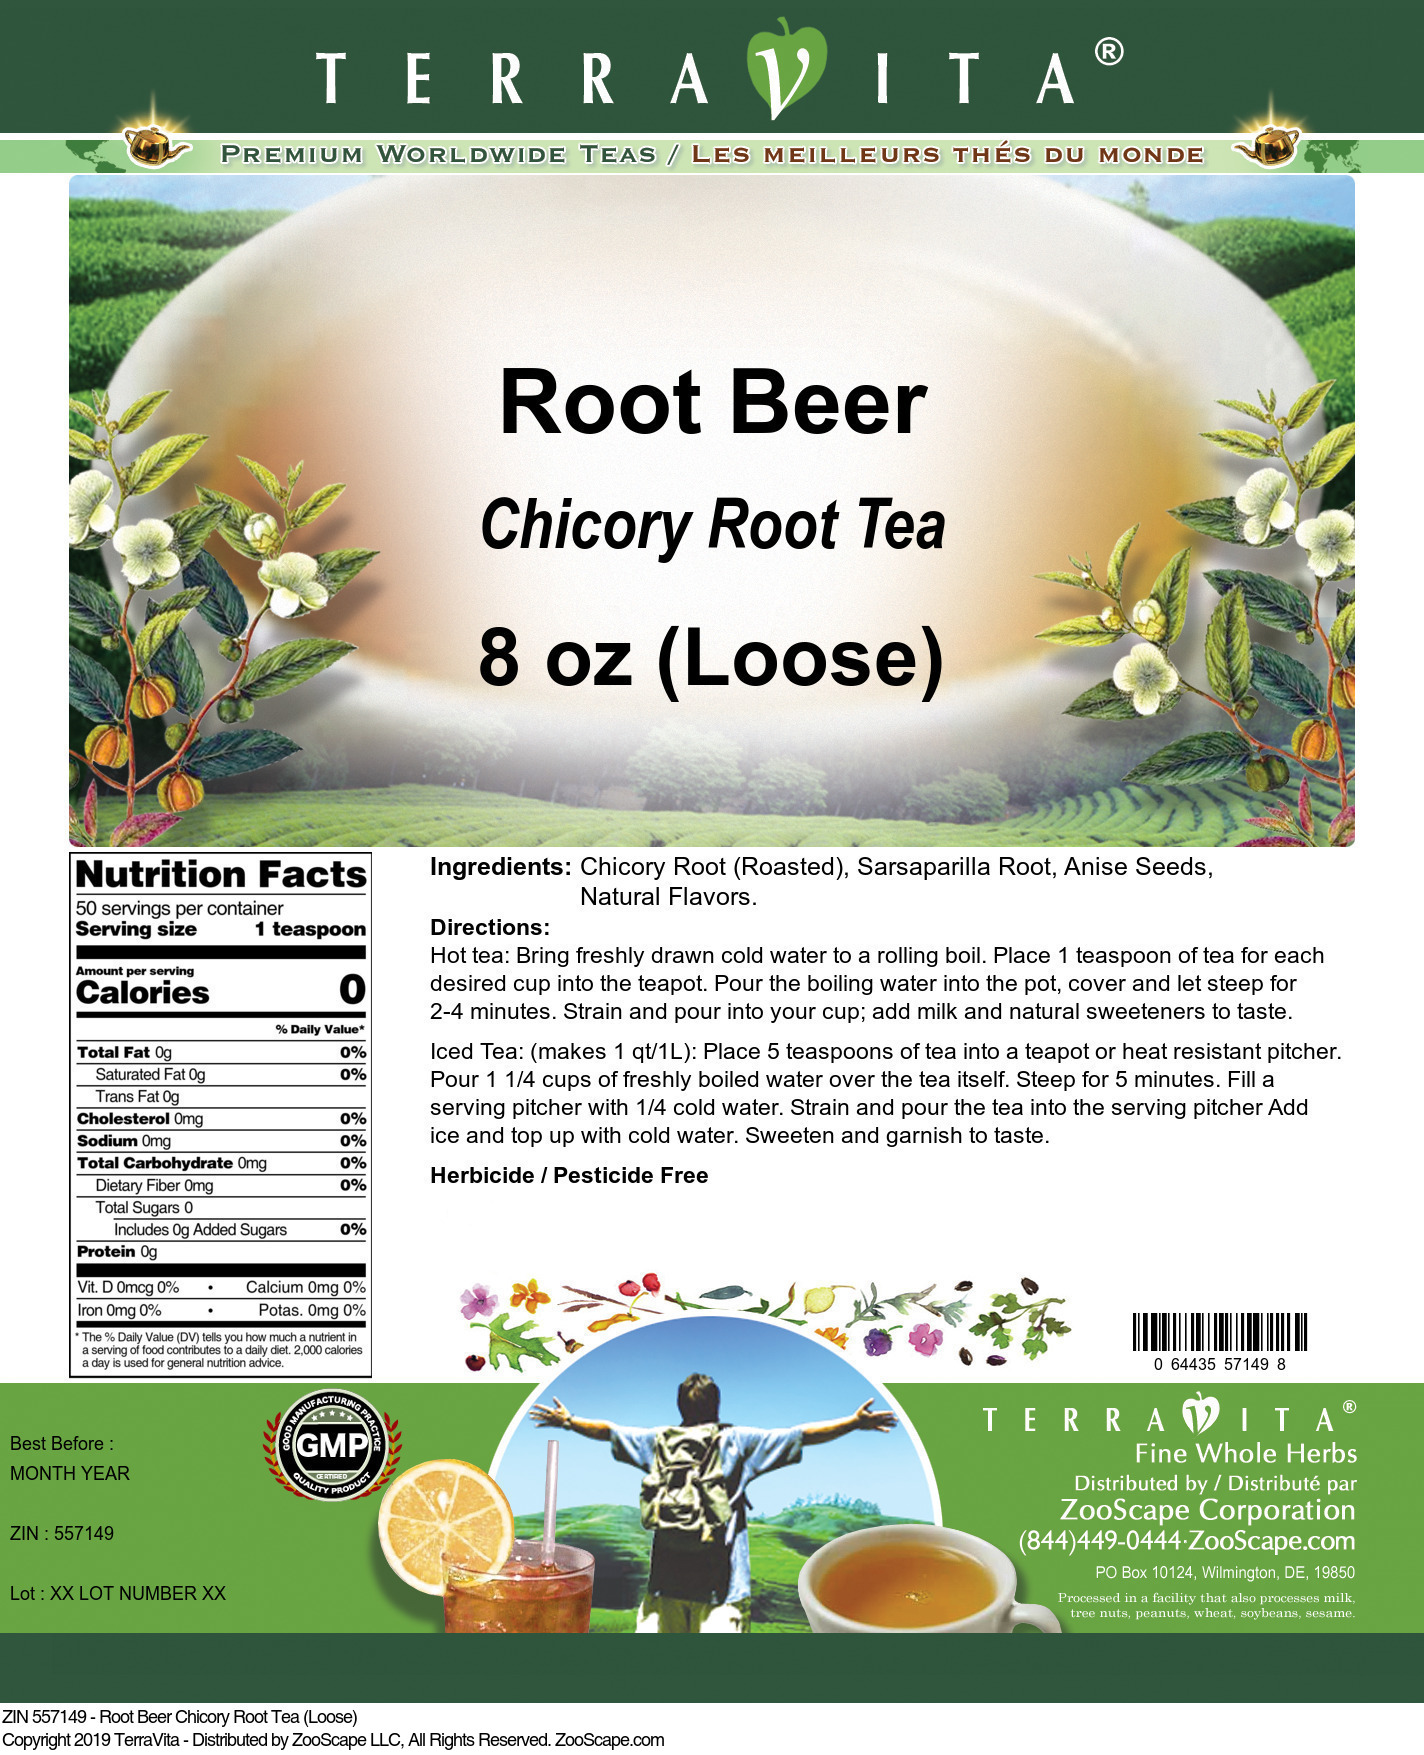 Root Beer Chicory Root Tea (Loose)